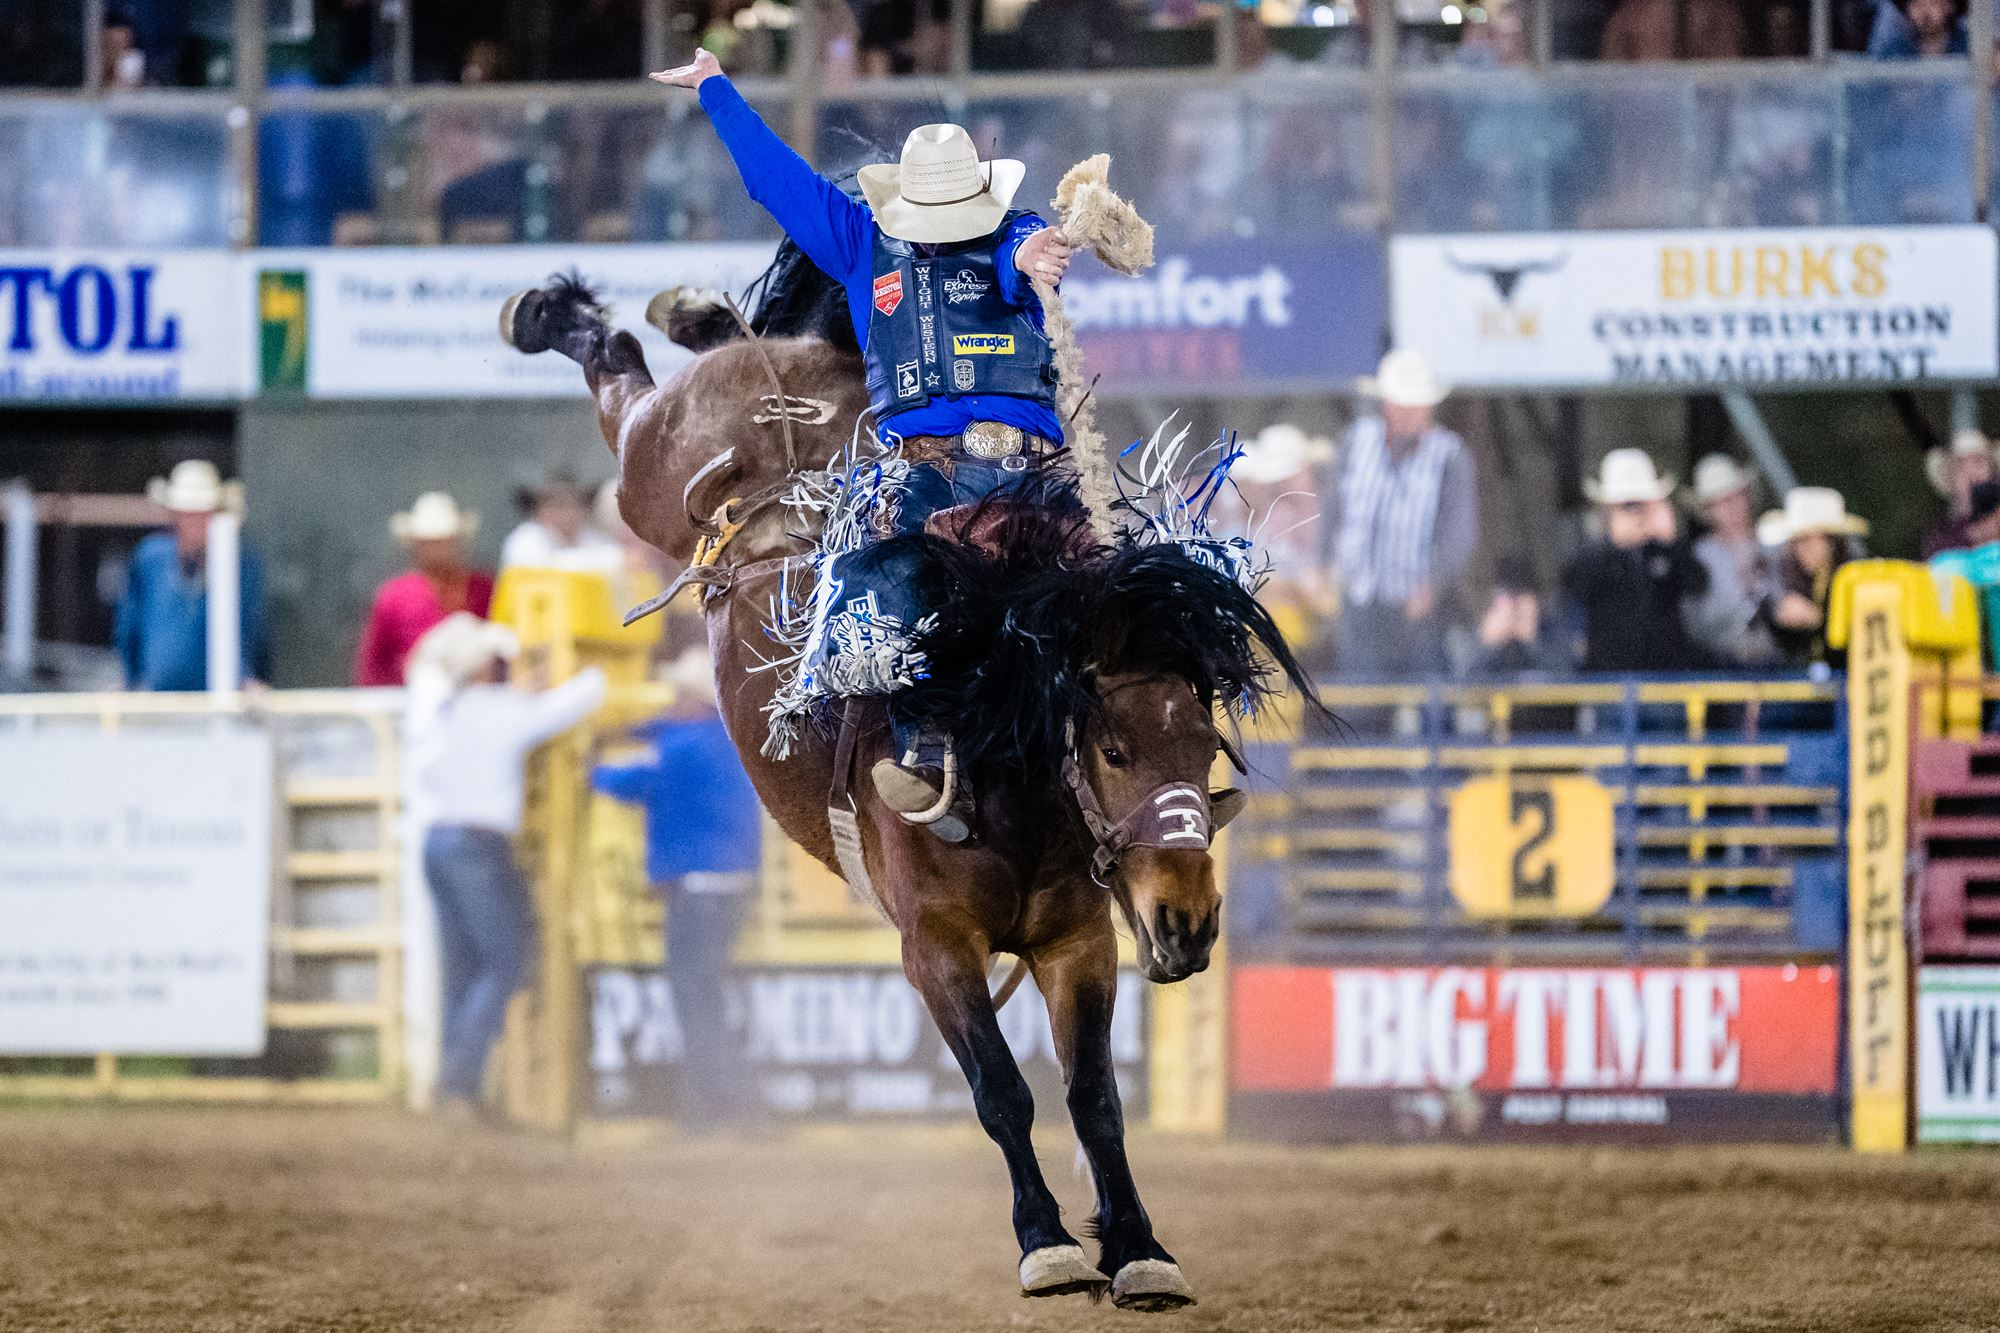 Saddle Bronc Riding- Spencer Wright